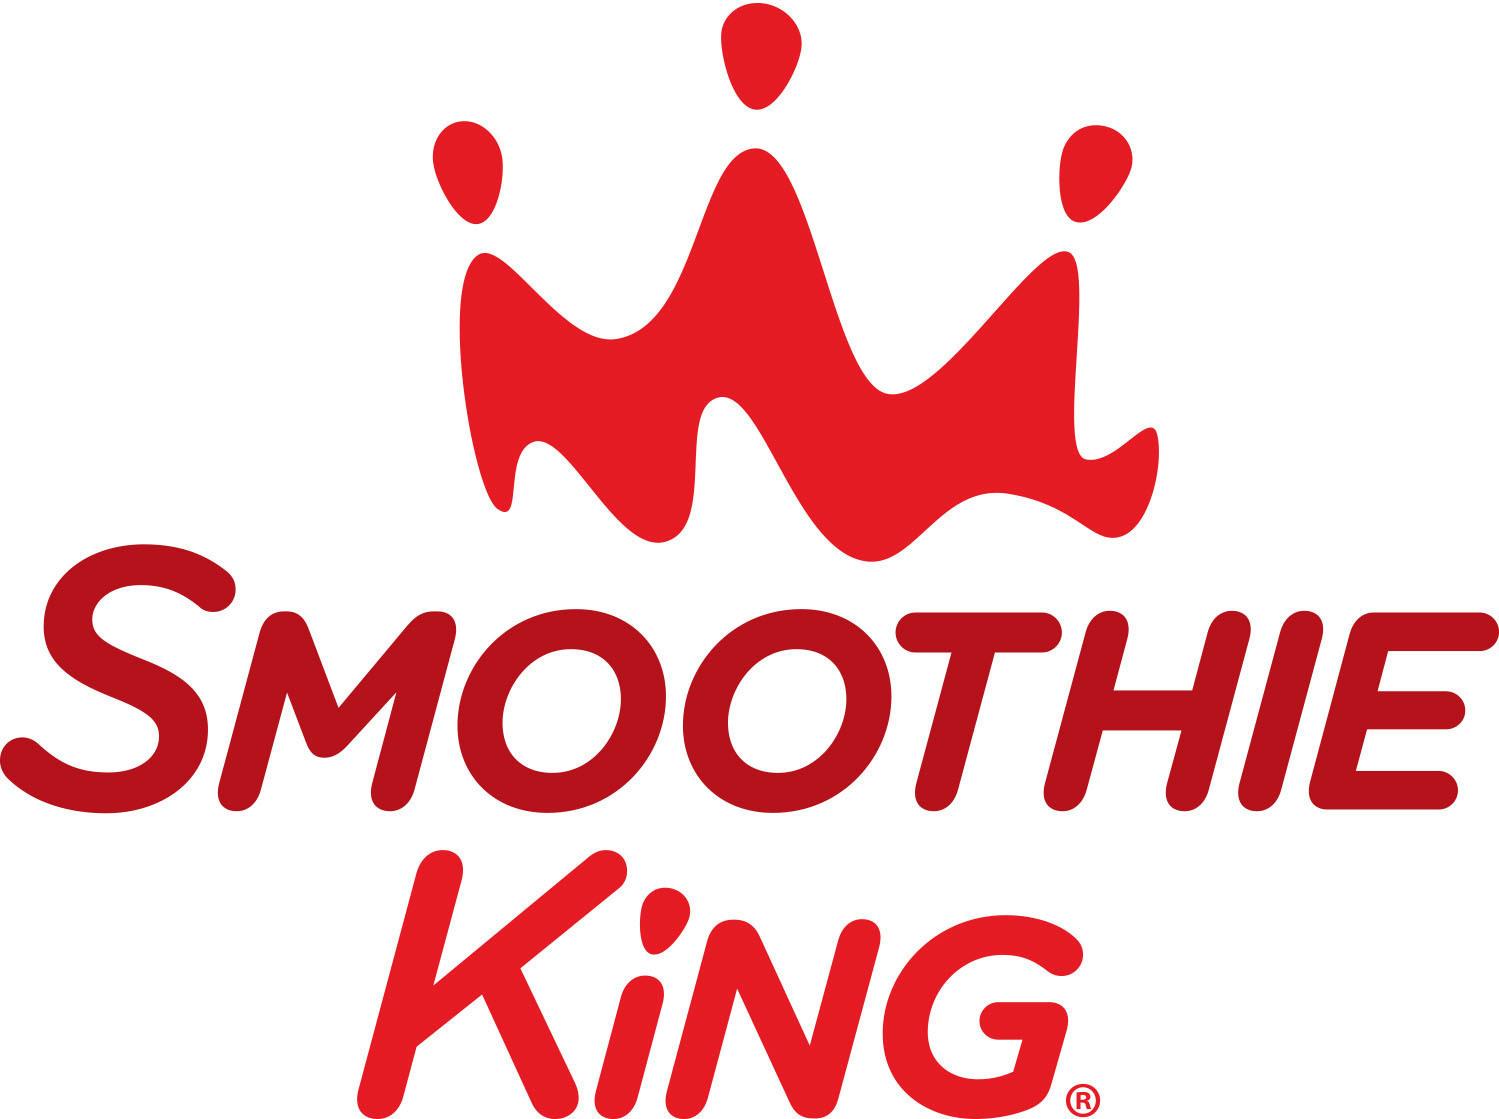 Smoothie King Franchises, Inc. (PRNewsFoto/Smoothie King Franchises, Inc.)